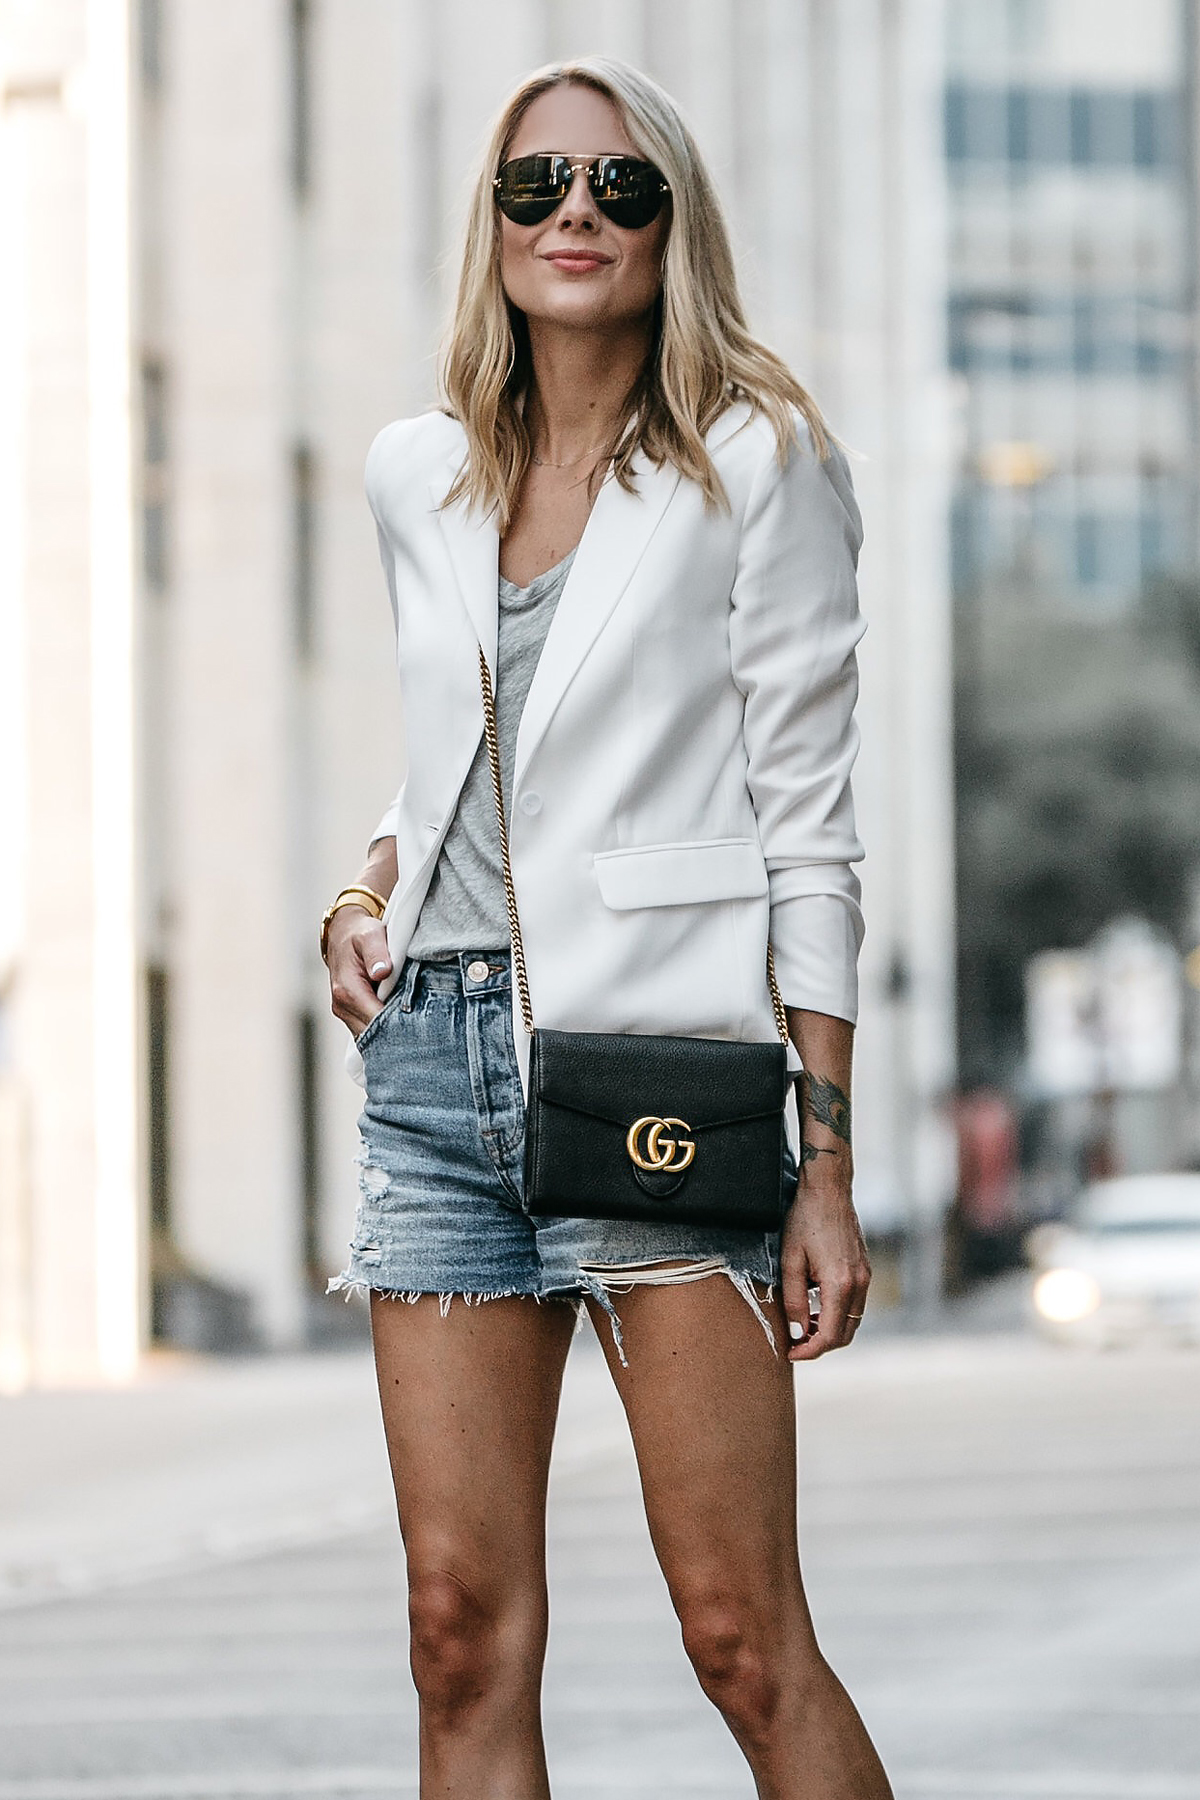 Blonde Woman Wearing Nordstrom White Blazer Everlane Grey Tshirt Topshop Ripped Denim Shorts Outfit Gucci Marmont Handbag Fashion Jackson Dallas Blogger Fashion Blogger Street Style